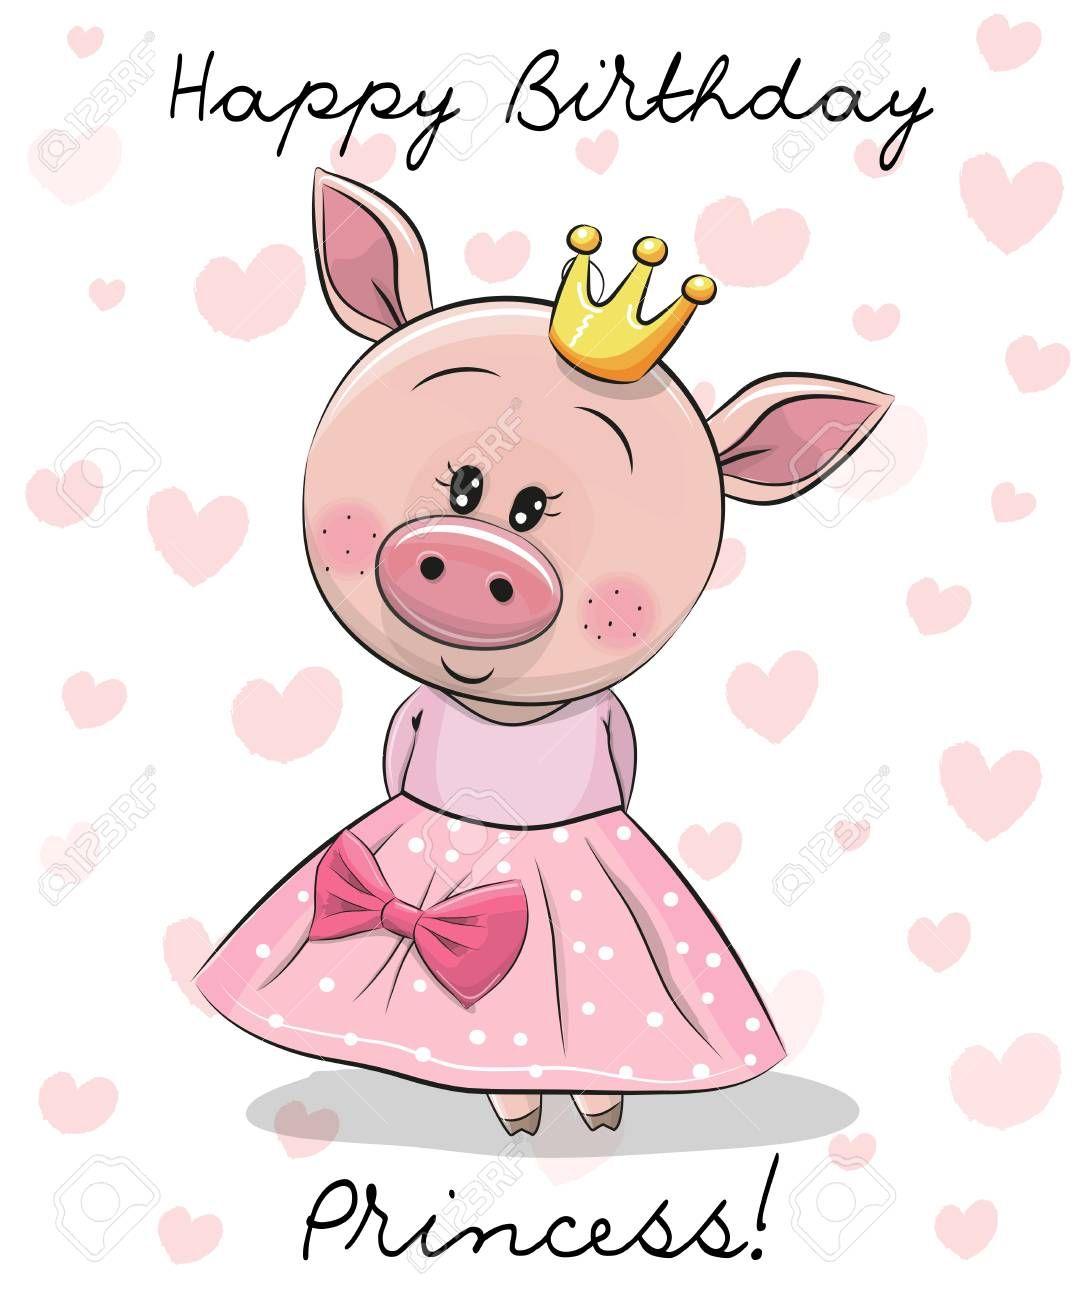 Happy Birthday Card With Cute Princess Pig Illustration